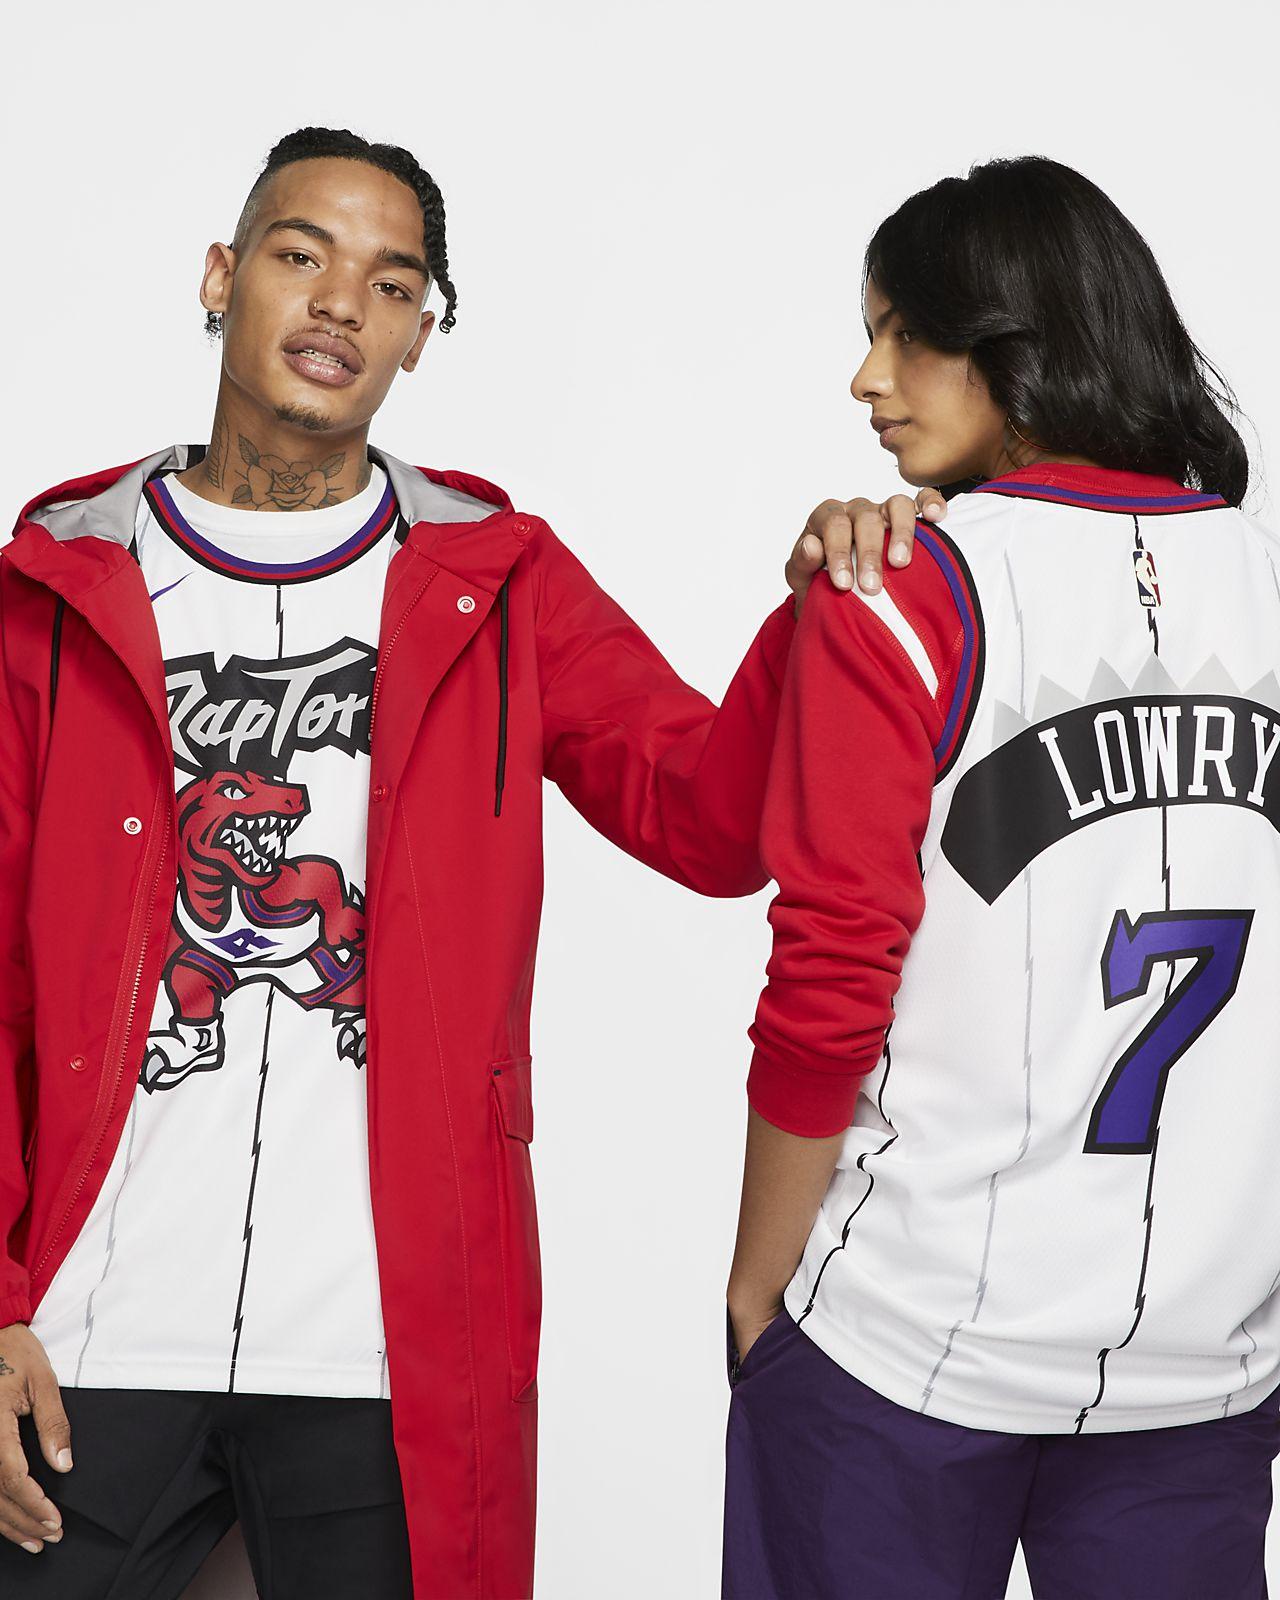 Kyle Lowry Classic Edition Swingman (Toronto Raptors) Nike NBA Connected Trikot für Herren